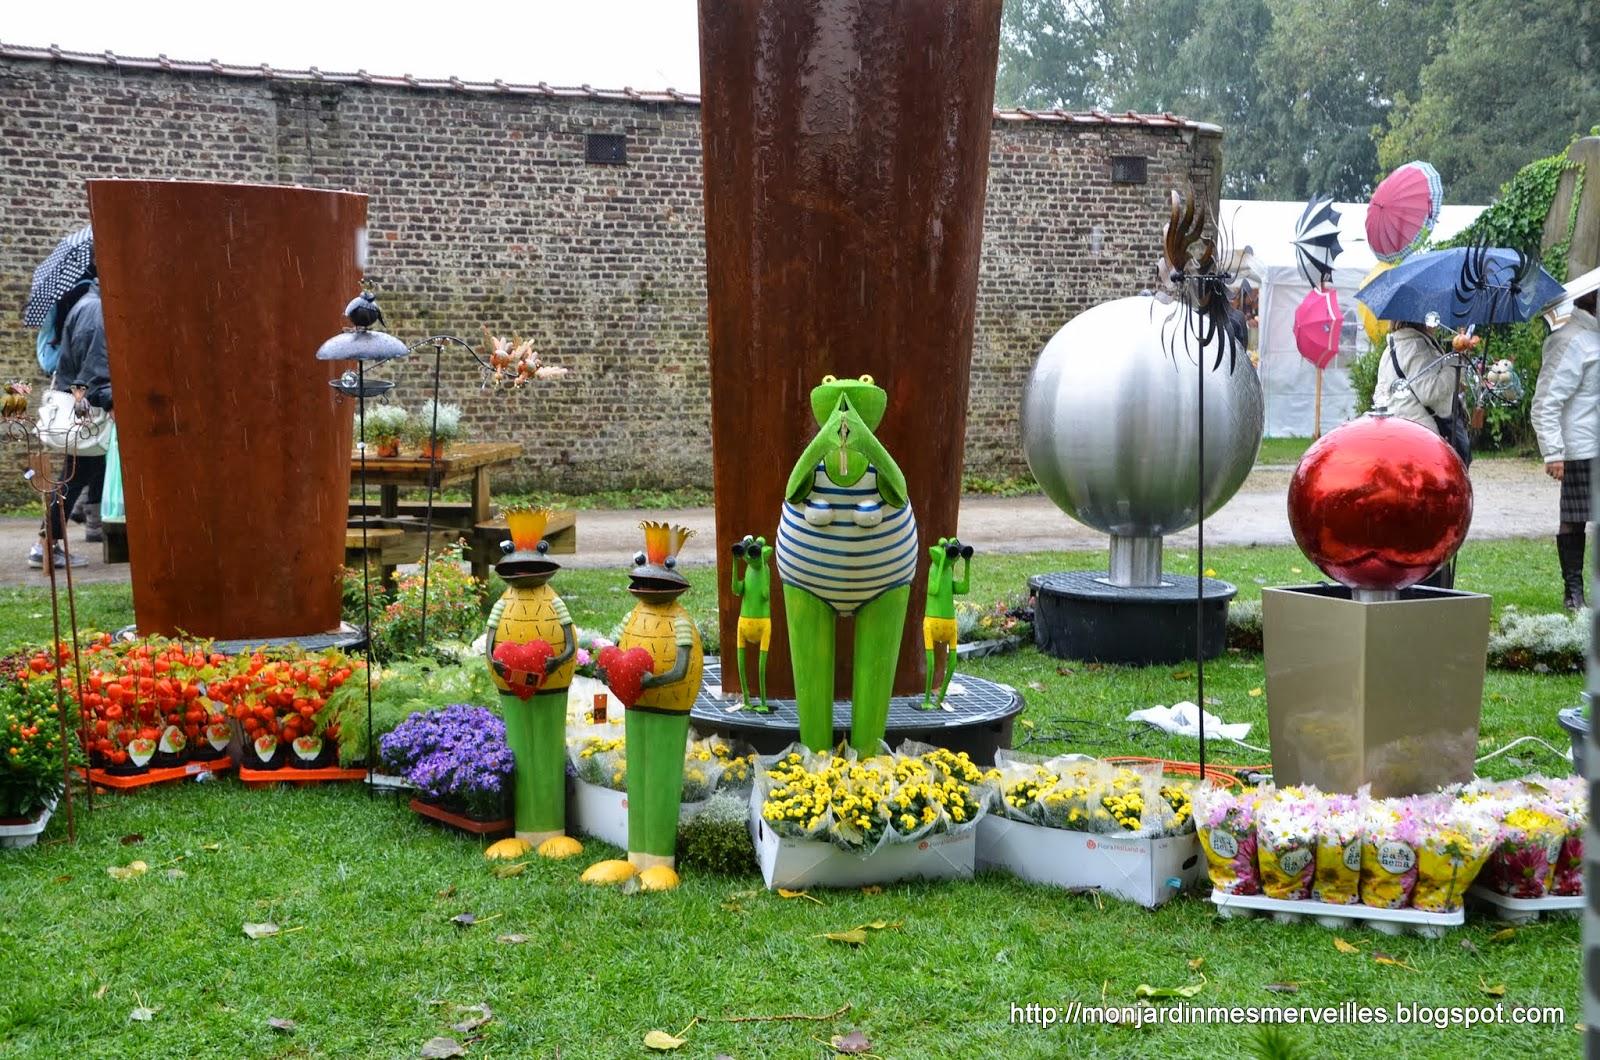 Mon Jardin Mes Merveilles: Beervelde - Octobre 2013 (4/5 ...